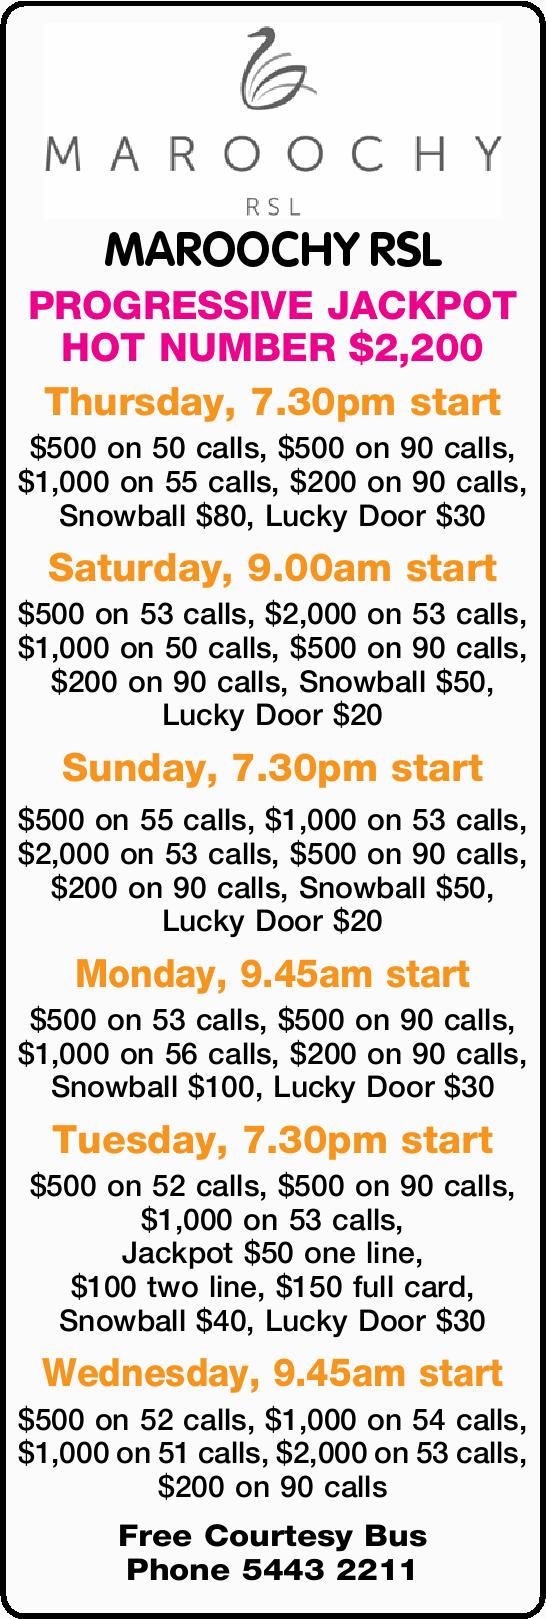 MAROOCHY RSL PROGRESSIVE JACKPOT HOT NUMBER $2,200 Thursday, 7.30pm start $500 on 50 calls, $500...